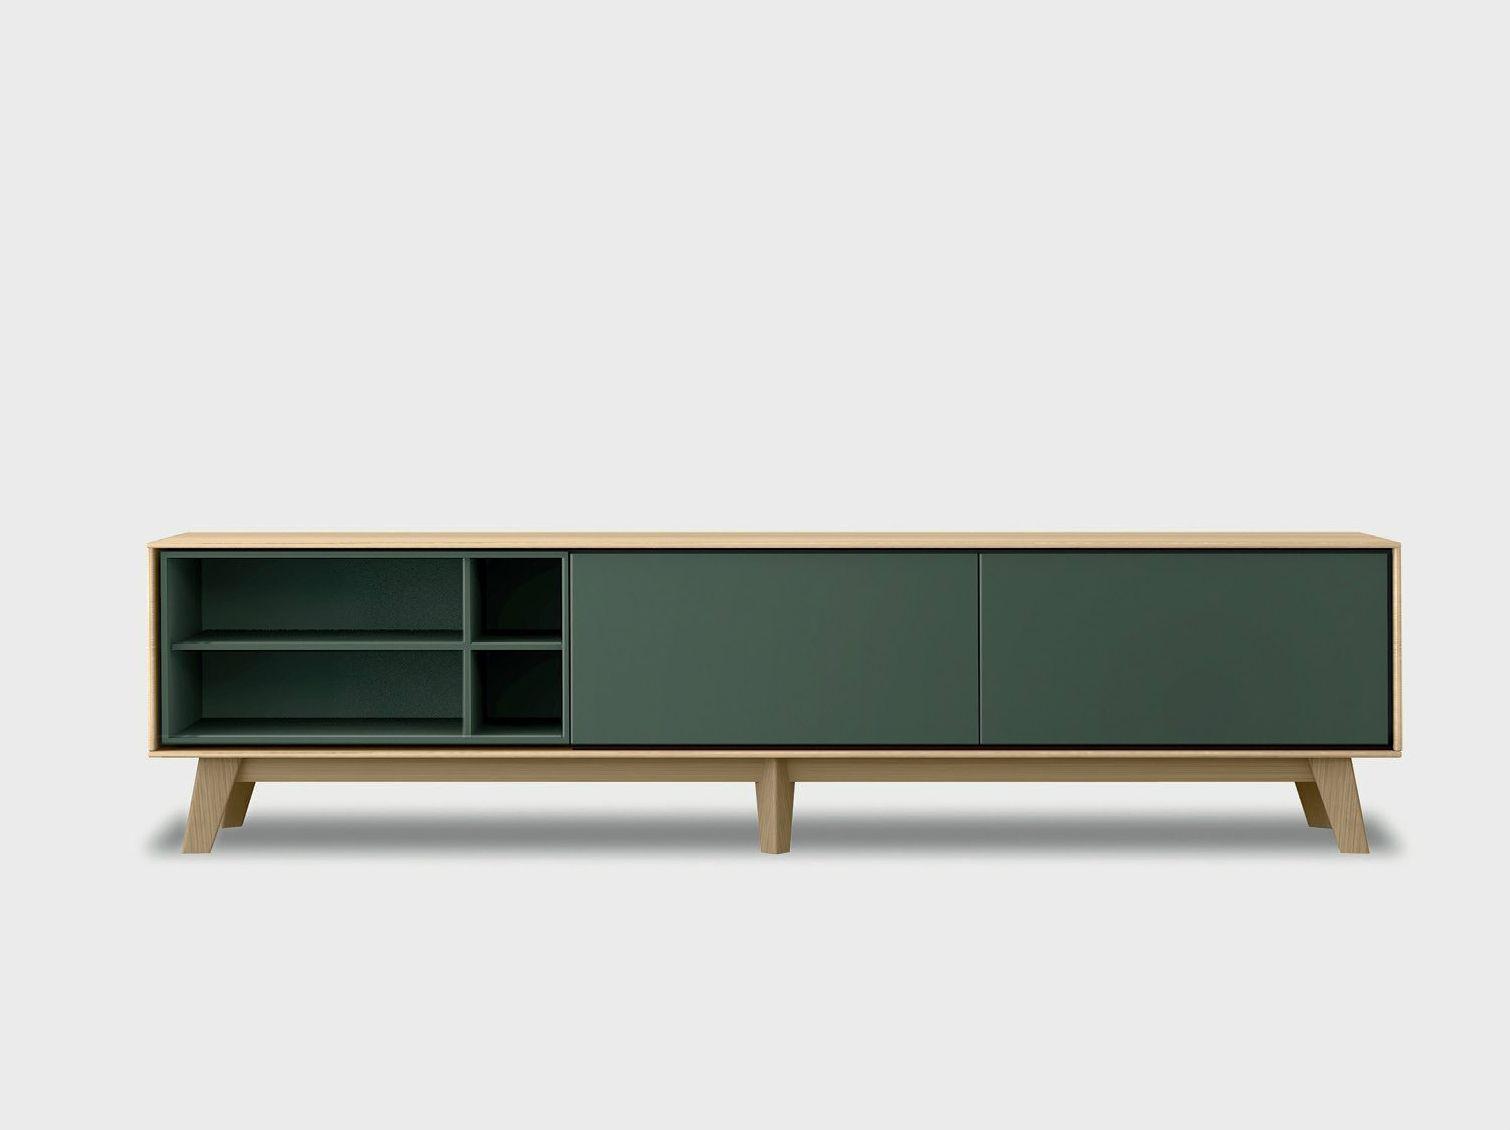 Metal furniture legs modern - Lacquered Solid Wood Sideboard Aura C2 3 By Treku Design Angel Mart 237